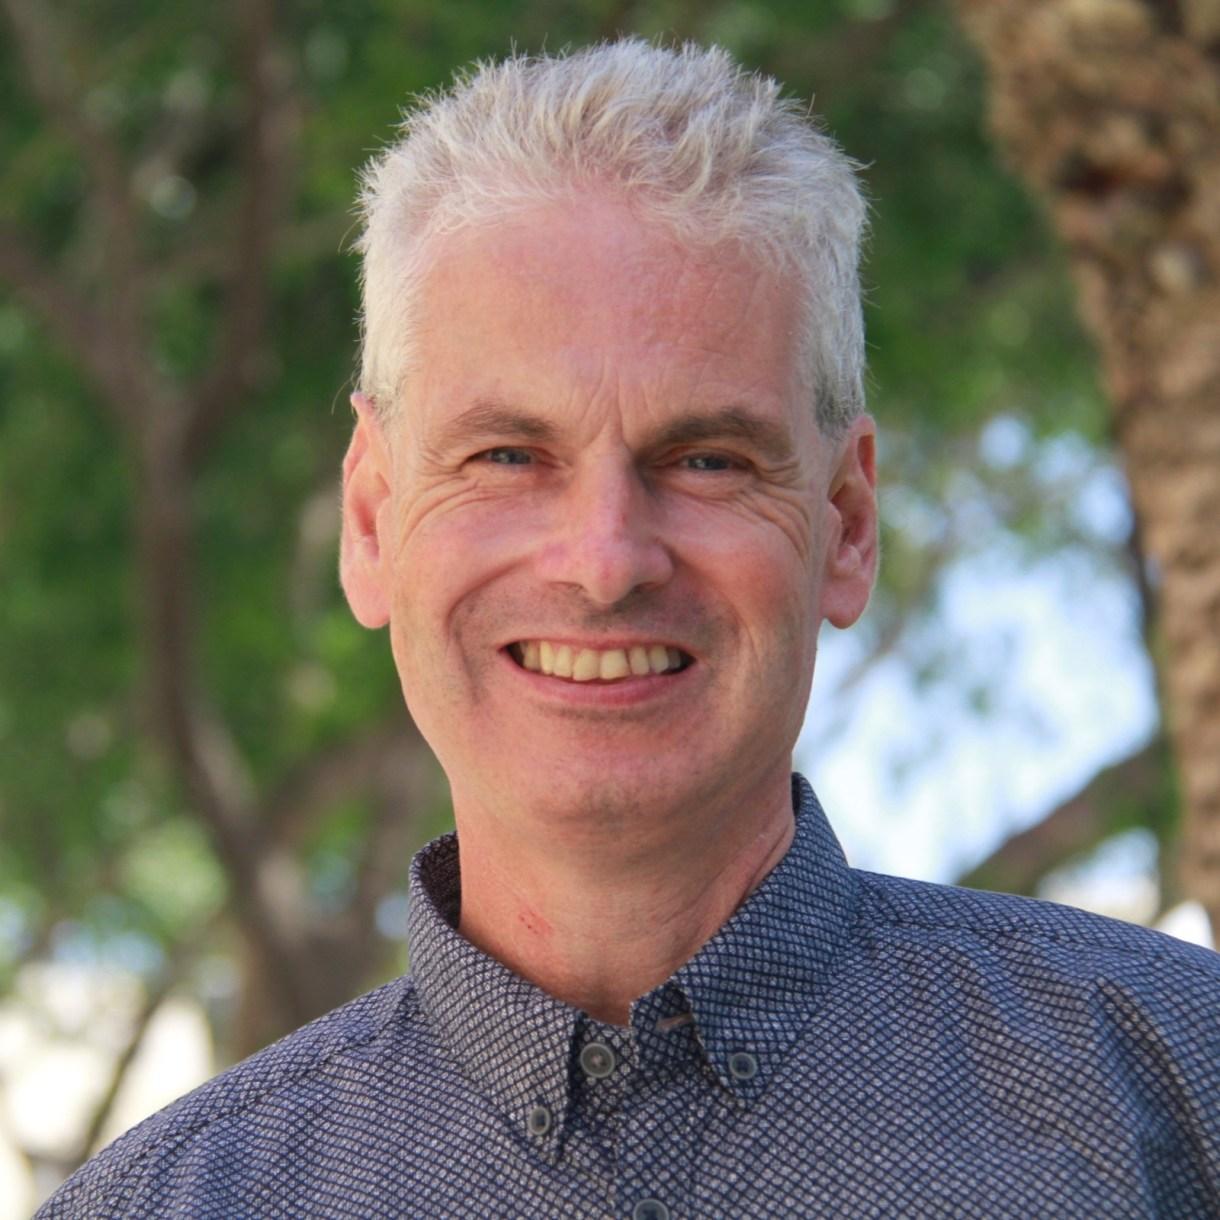 Damian Spiteri